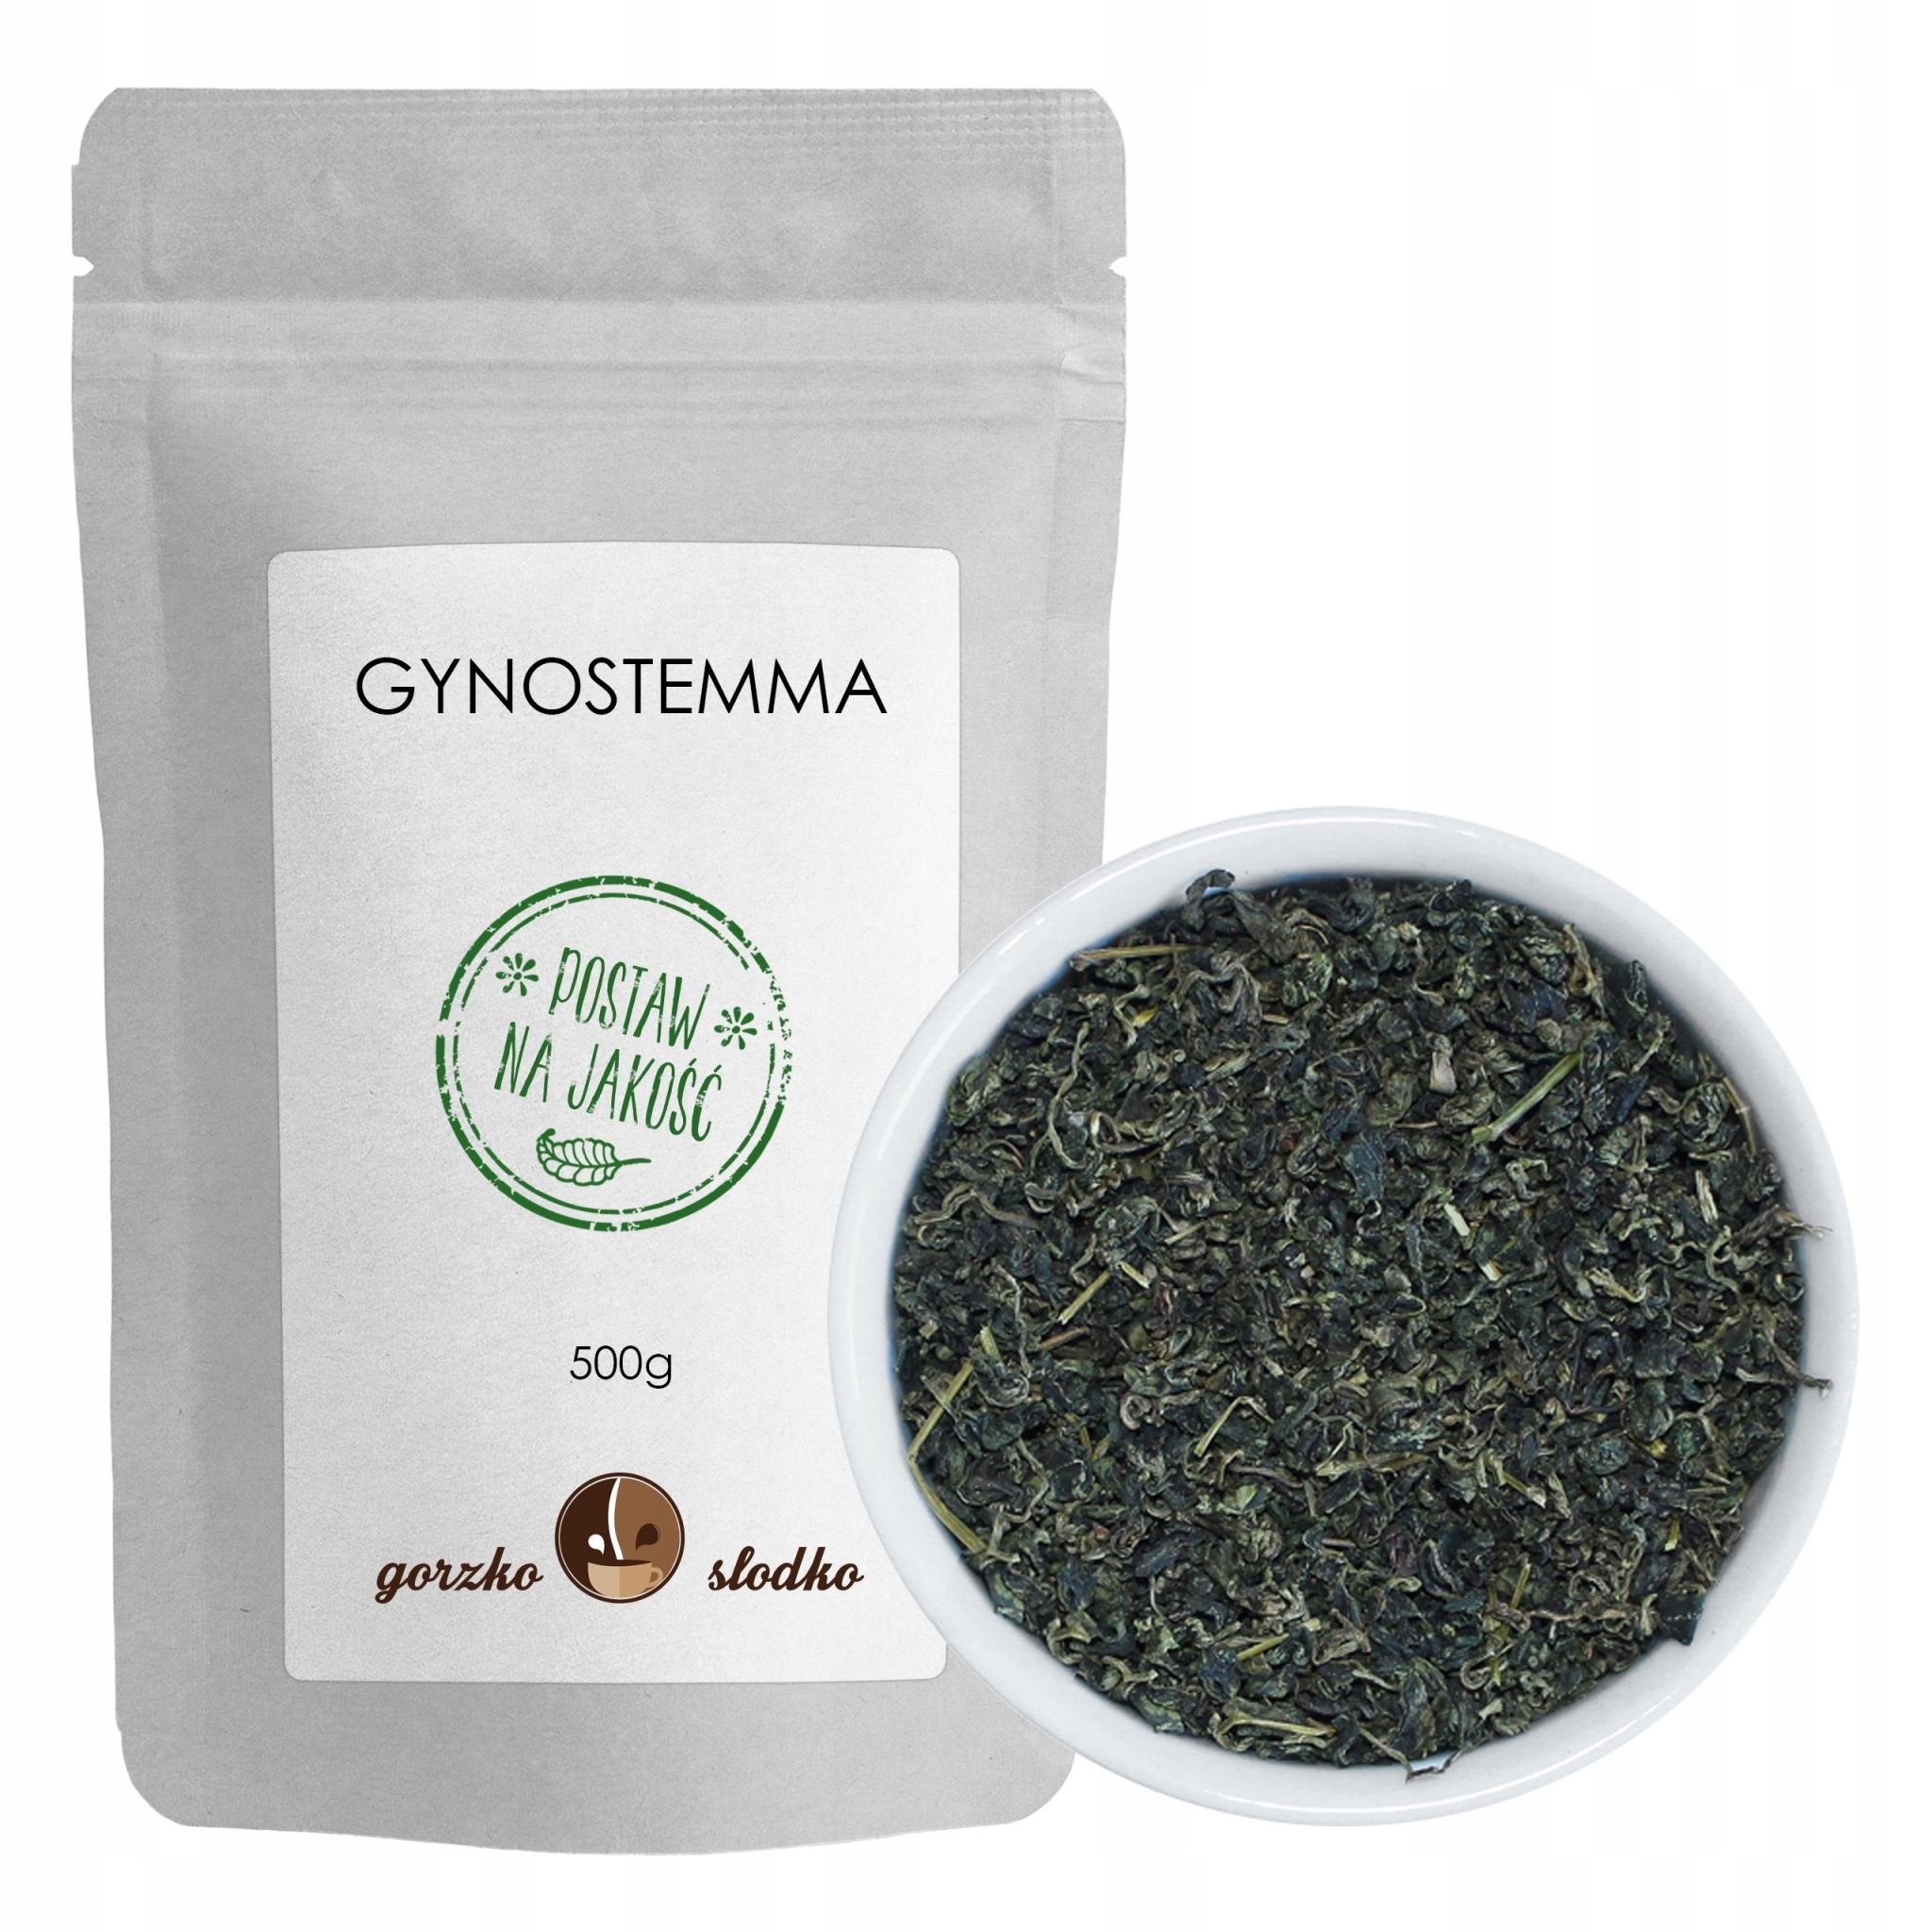 Item GYNOSTEMMA Jiaogulan herb of life 500g